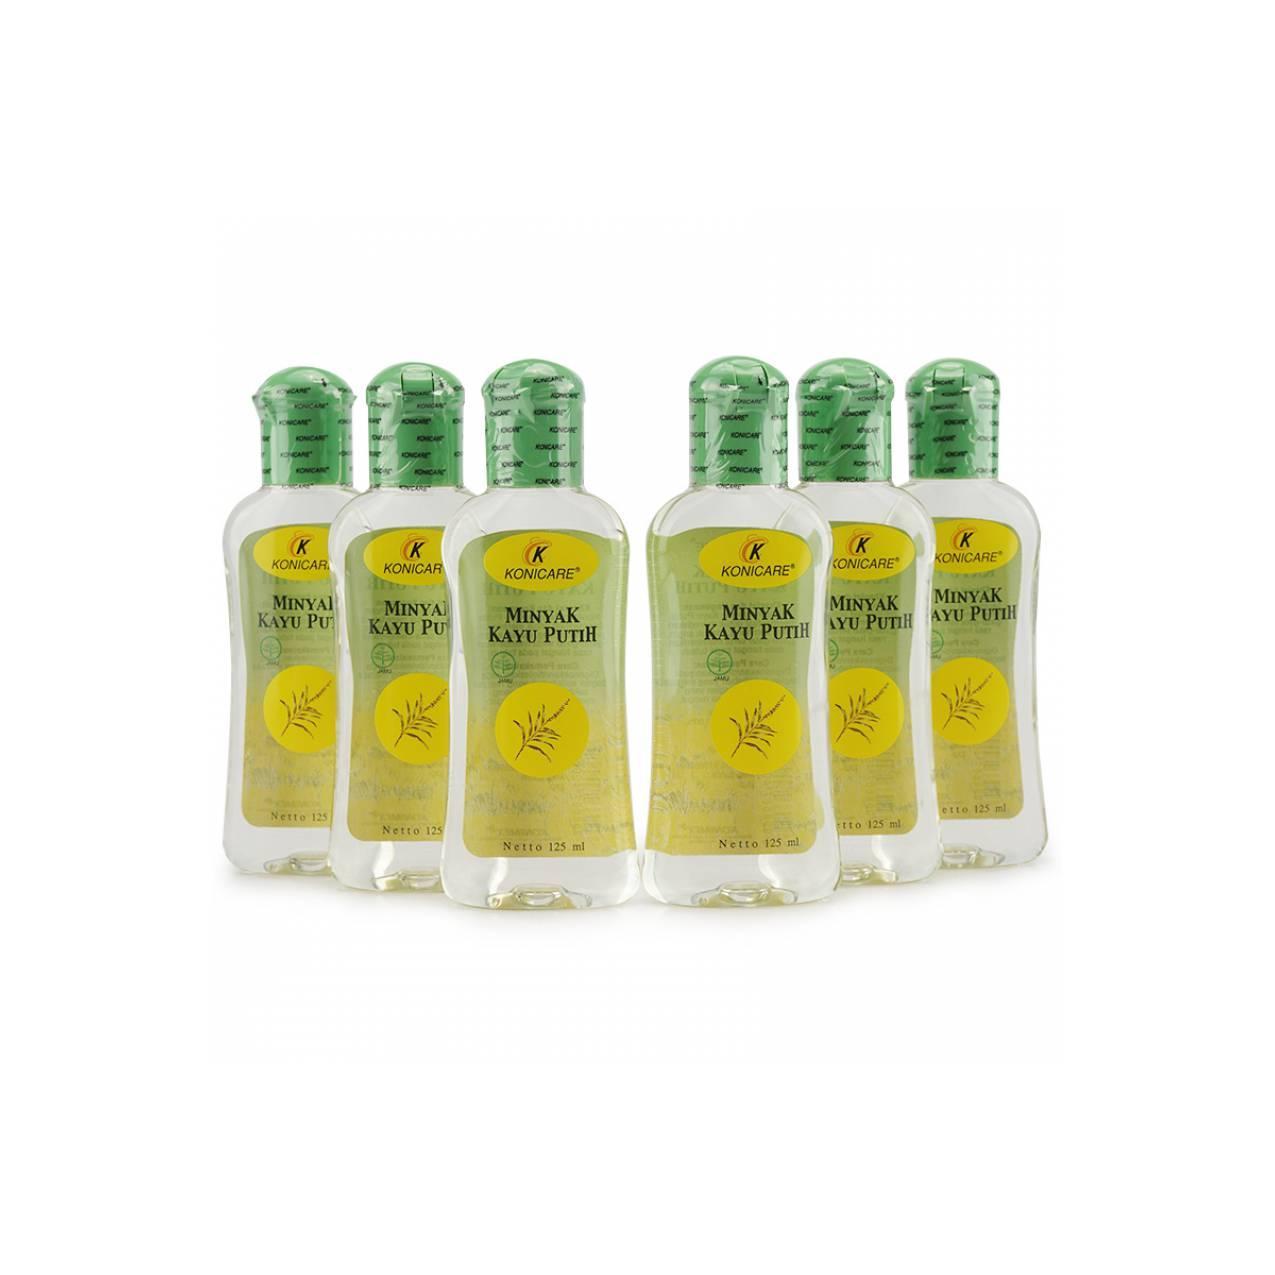 Minyak Kemiri Premium Penyubur Penumbuh Bulu Rambut Black Original Al Khodry | Shopee .